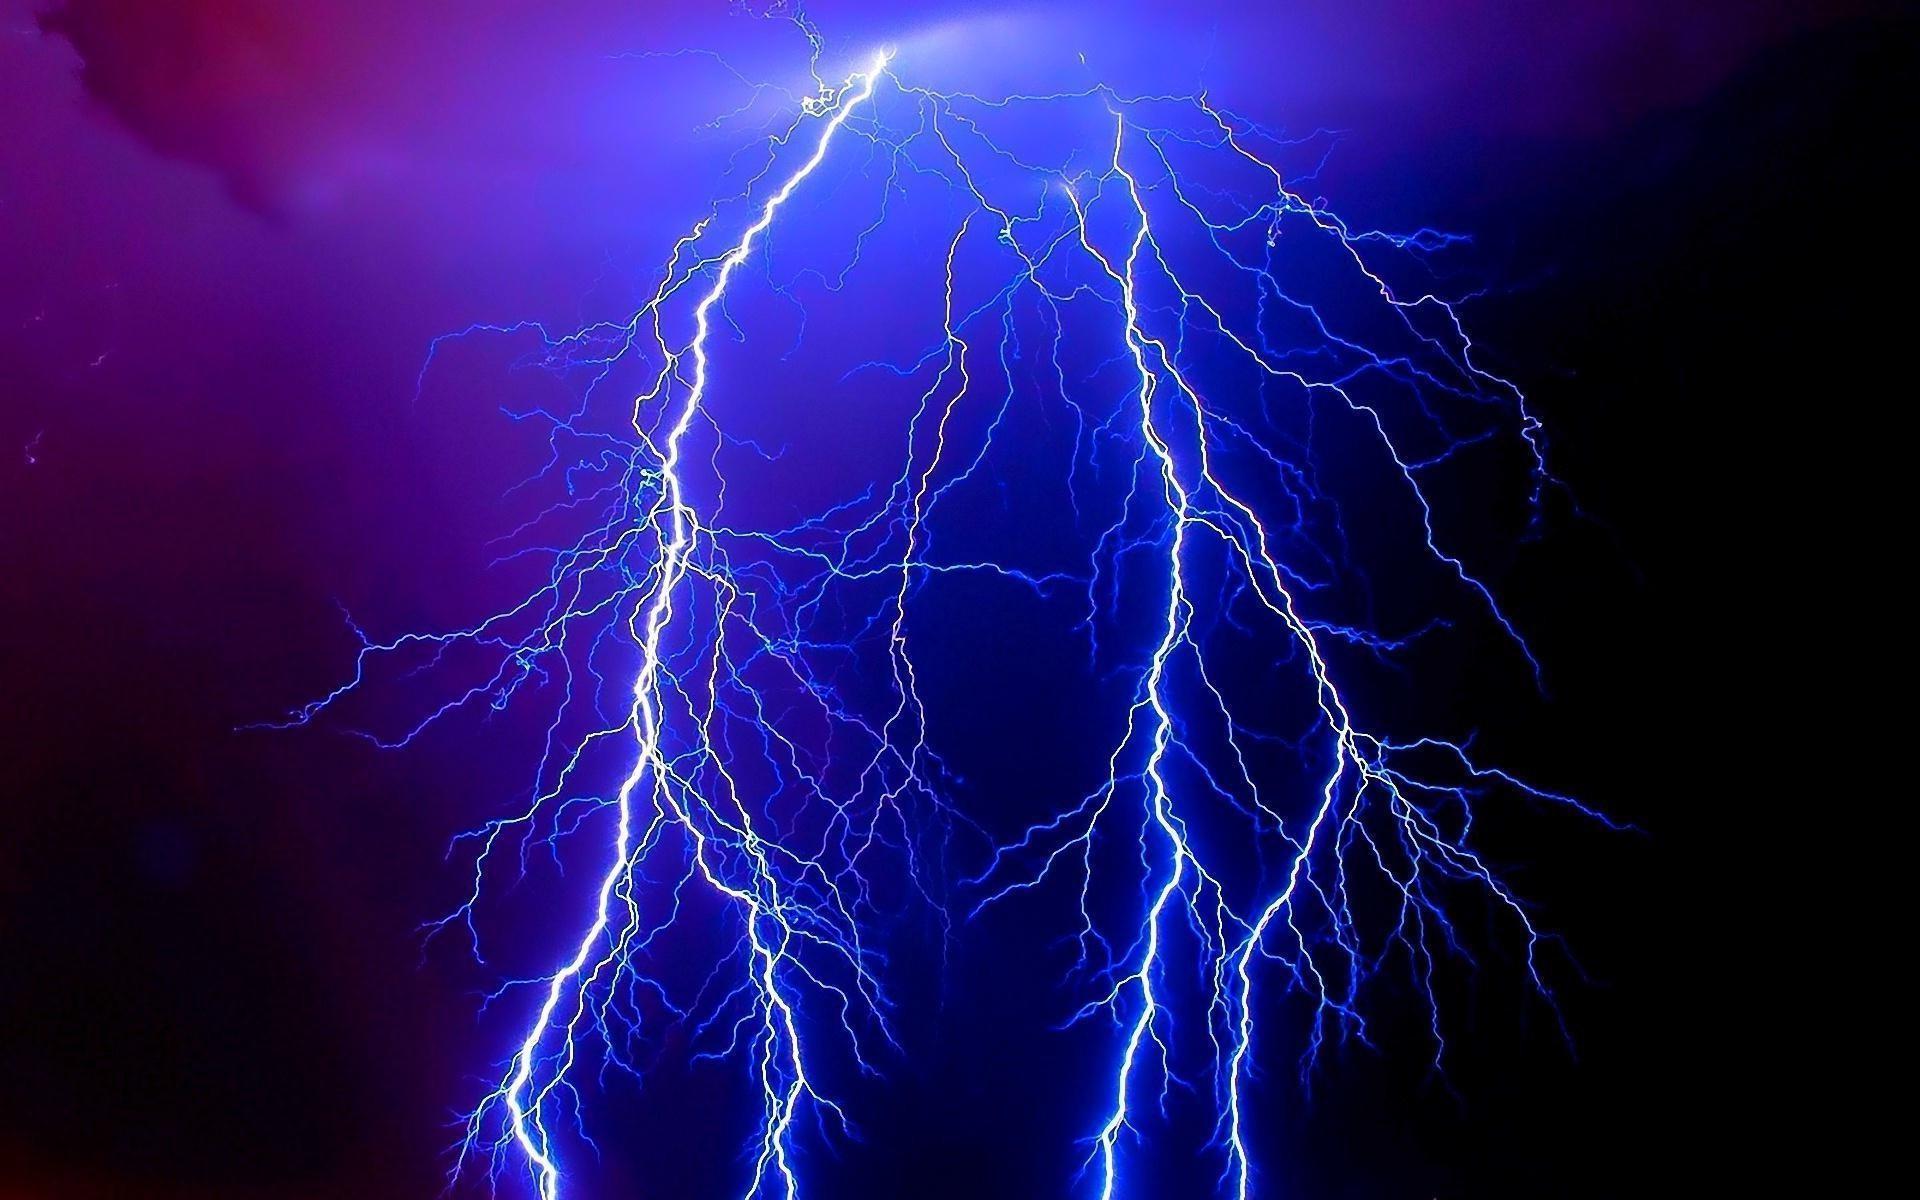 Lightning Bolt Wallpaper 62 Images